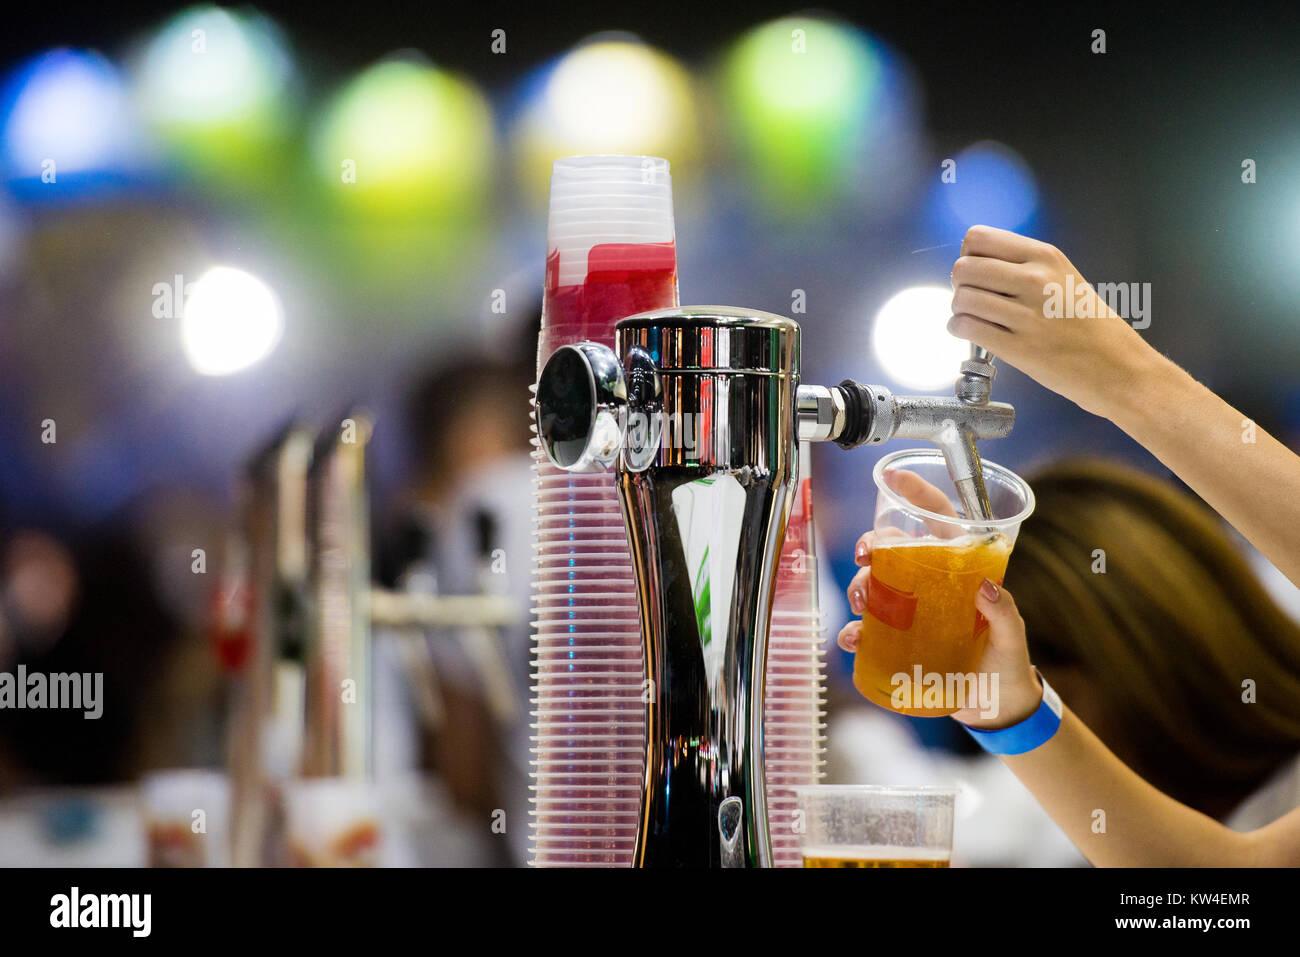 Bartender dispensing draft beer in a bar from beer dispenser - Stock Image